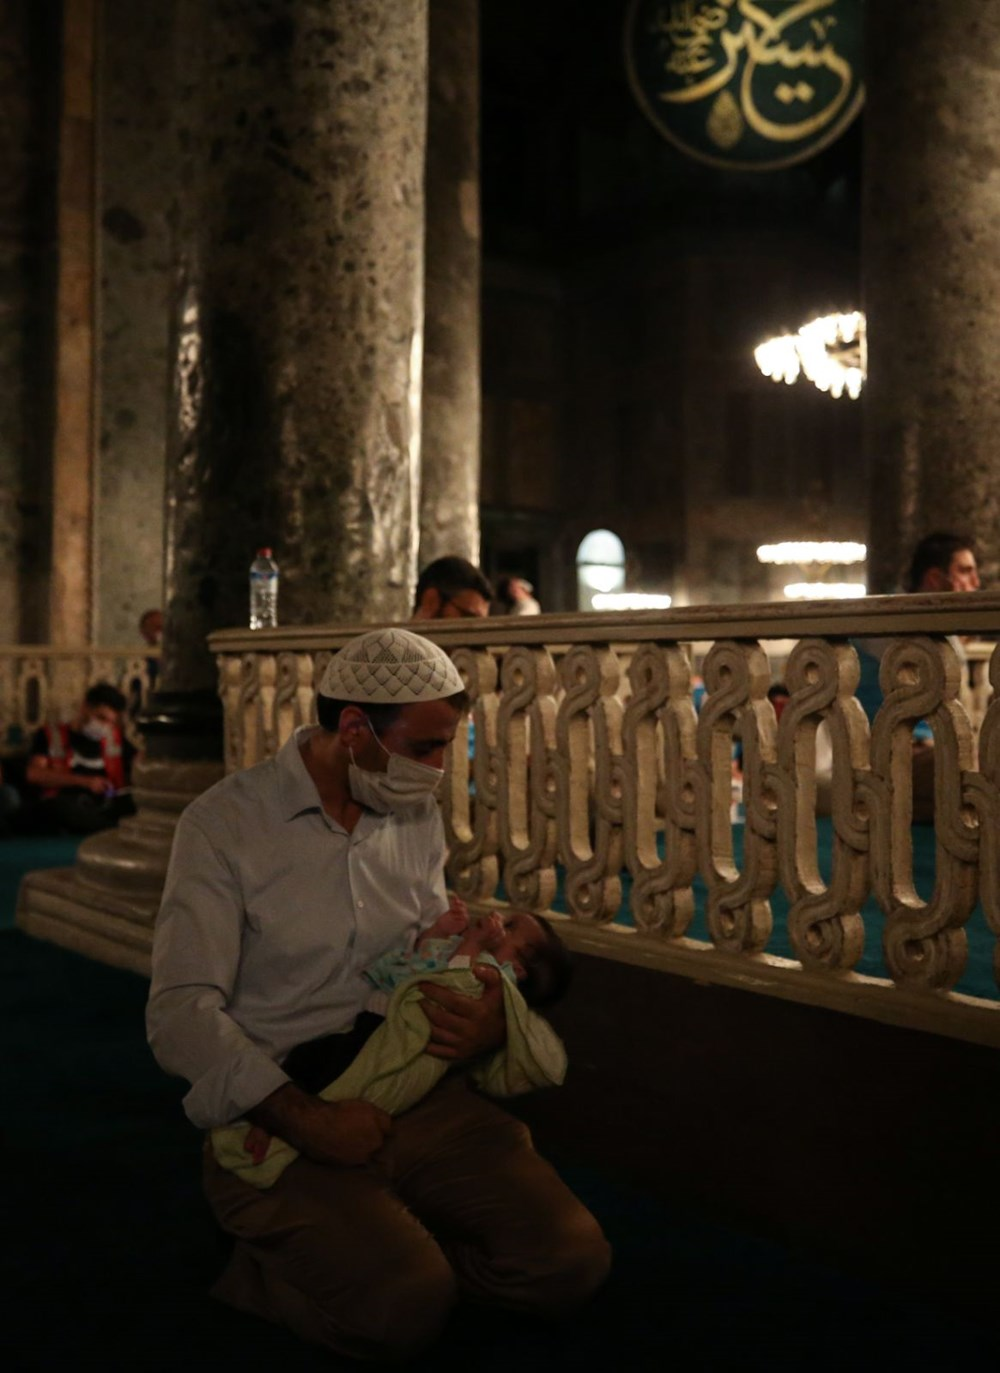 The crowd does not decrease in Hagia Sophia - 9